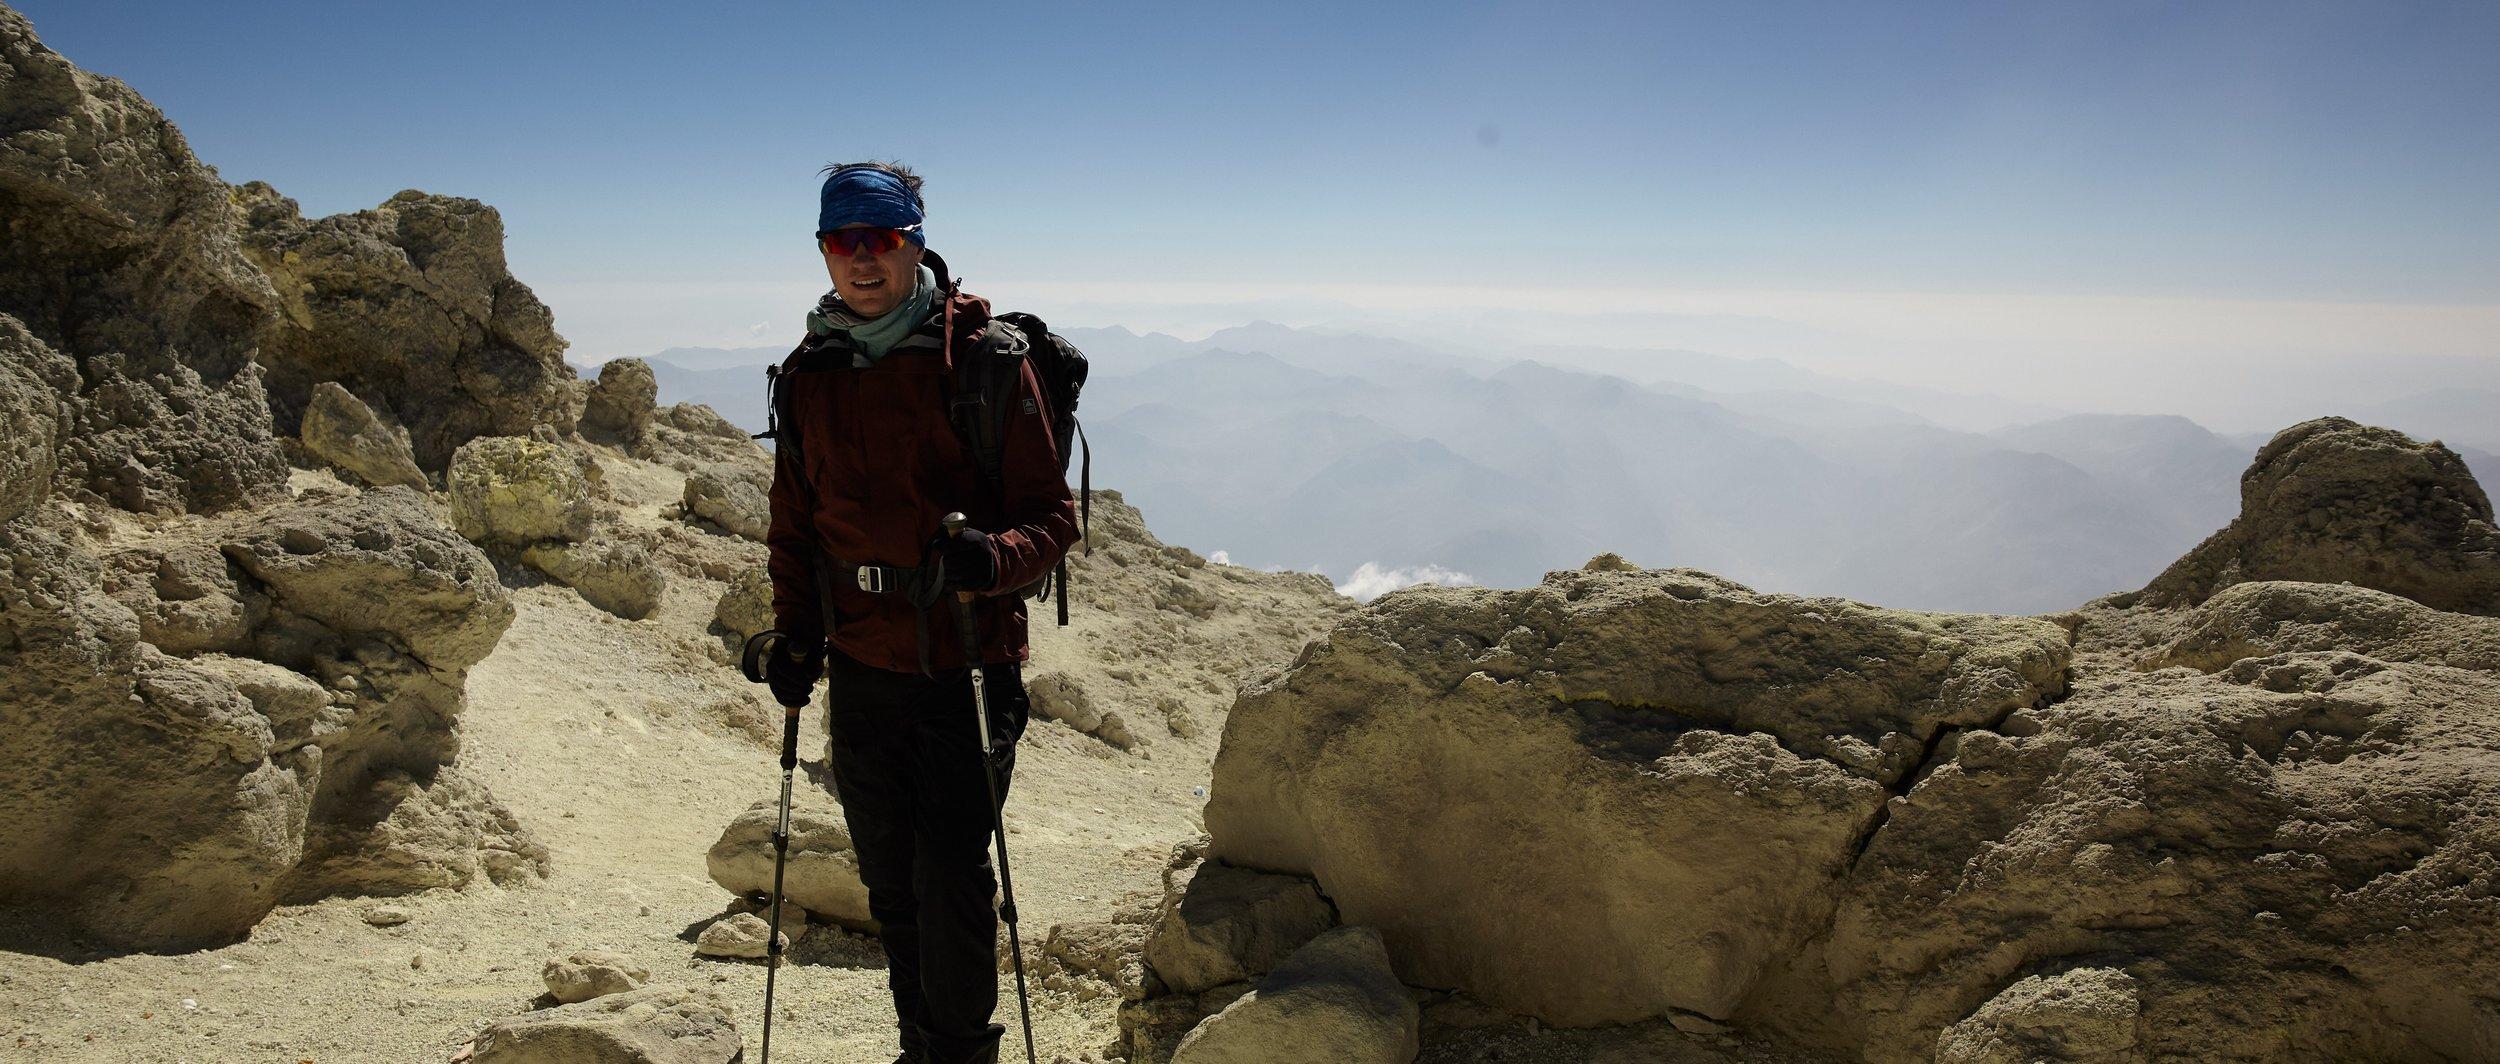 Georgi summit push, Mt. Damavand, Iran